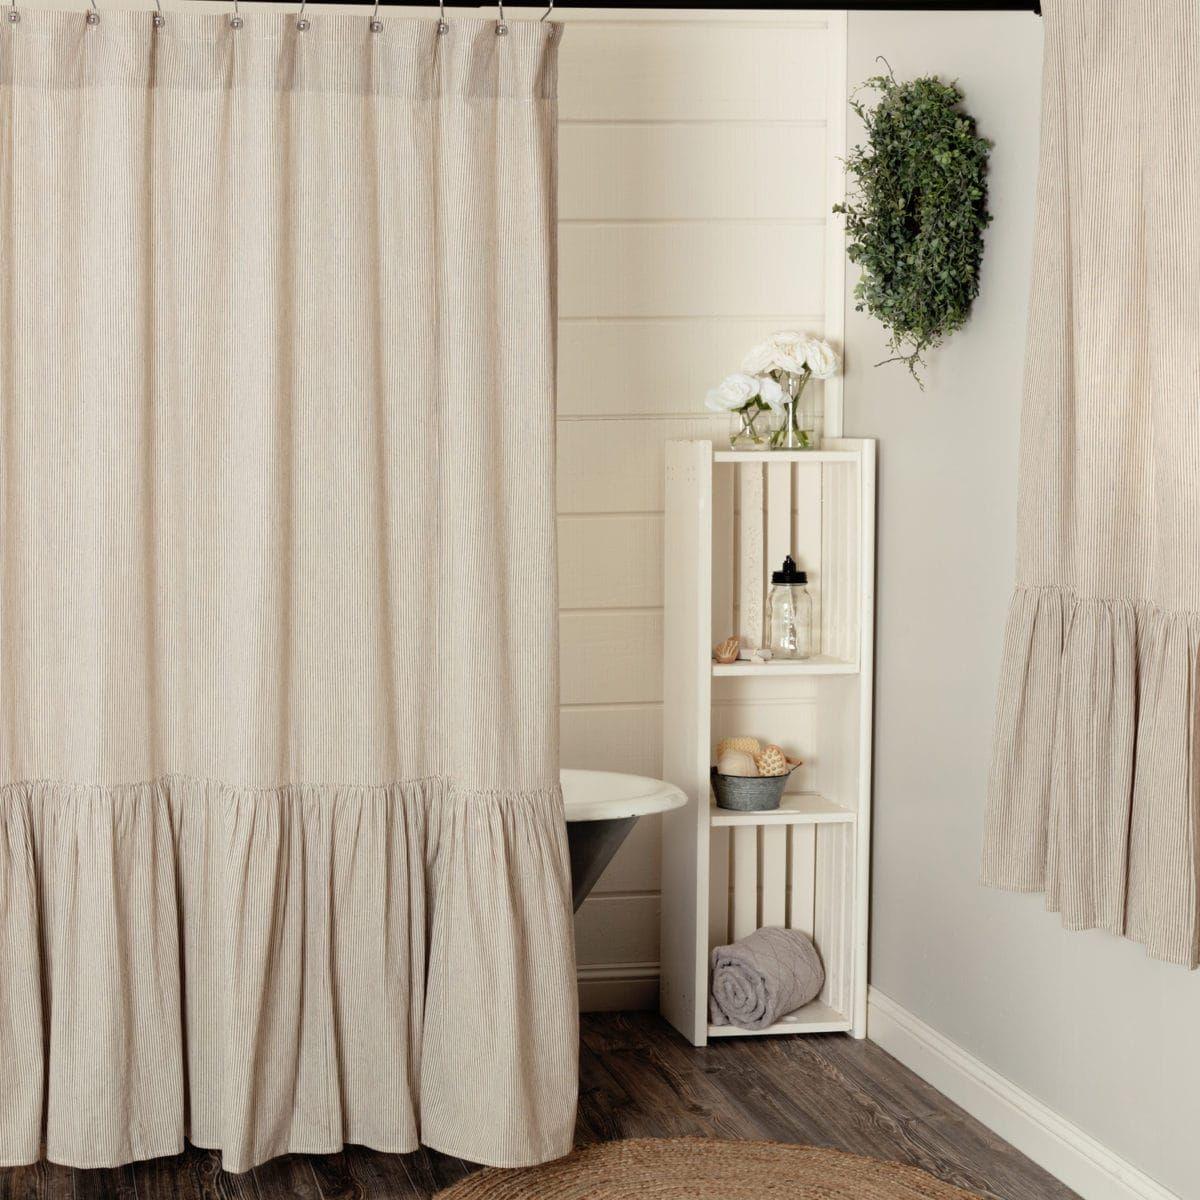 Sara S Ticking Black Ruffled Shower Curtain Piper Classics 2019